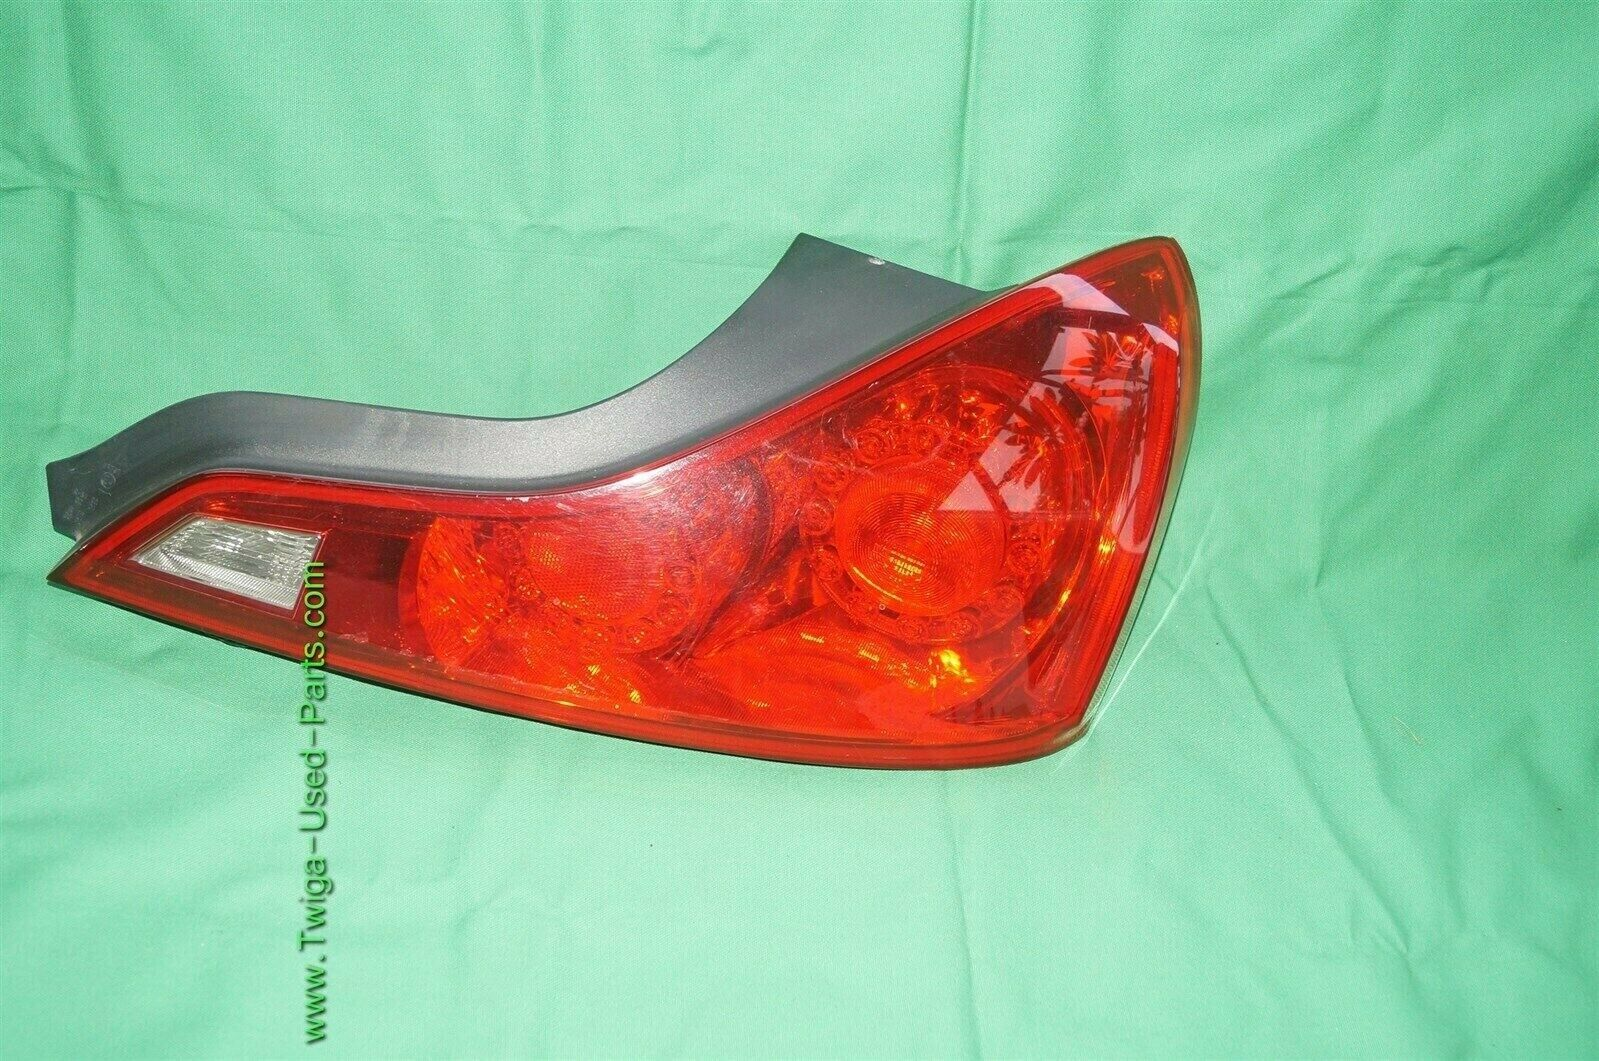 2008-13 Infiniti G37 Coupe Tail Light Lamp Passenger Right RH